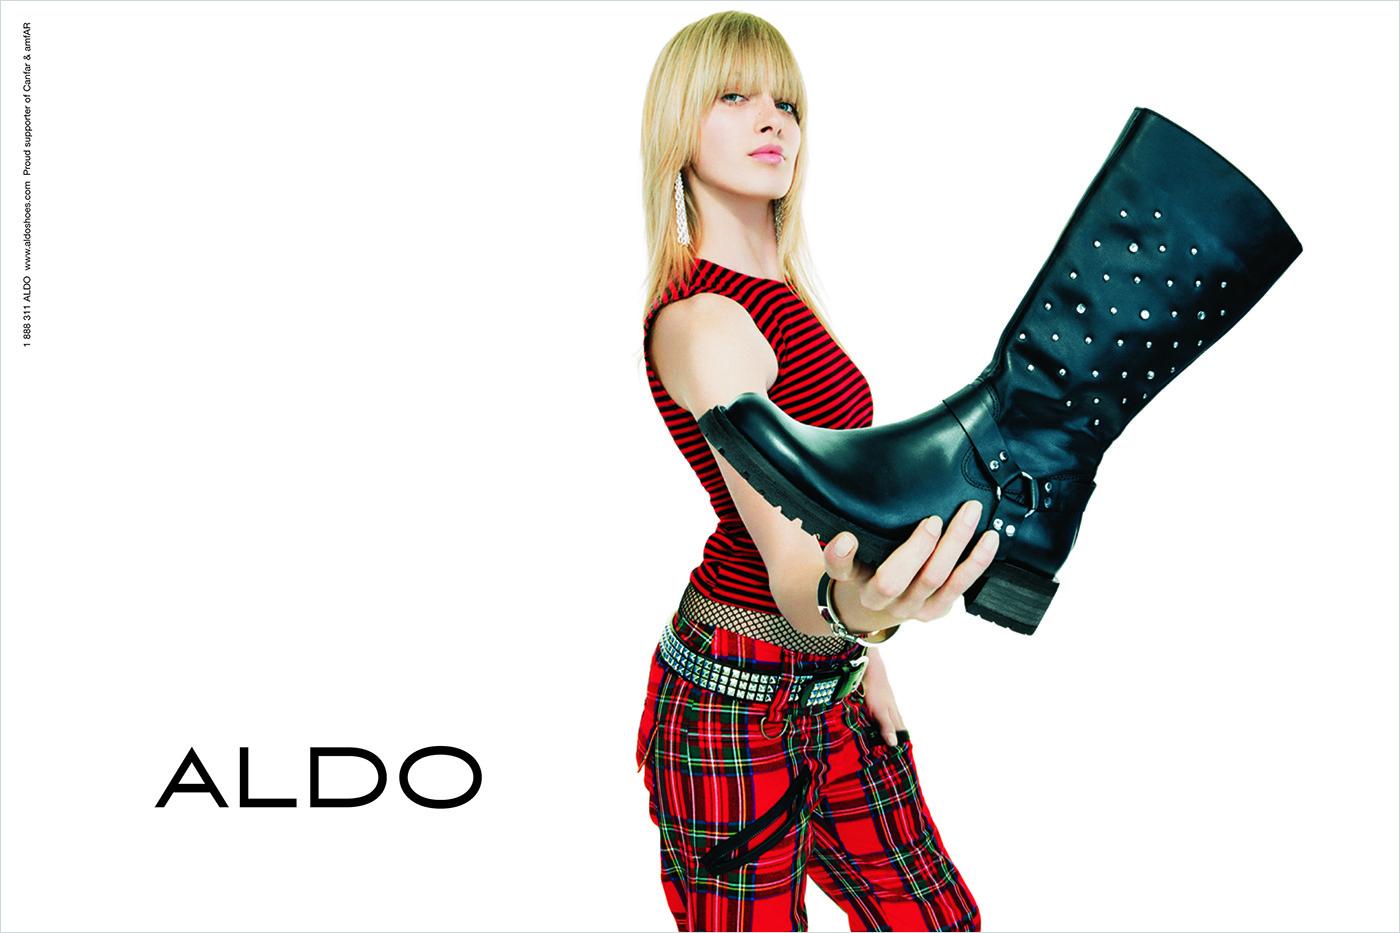 ALDO-FALL03-031-3000x2000.jpg